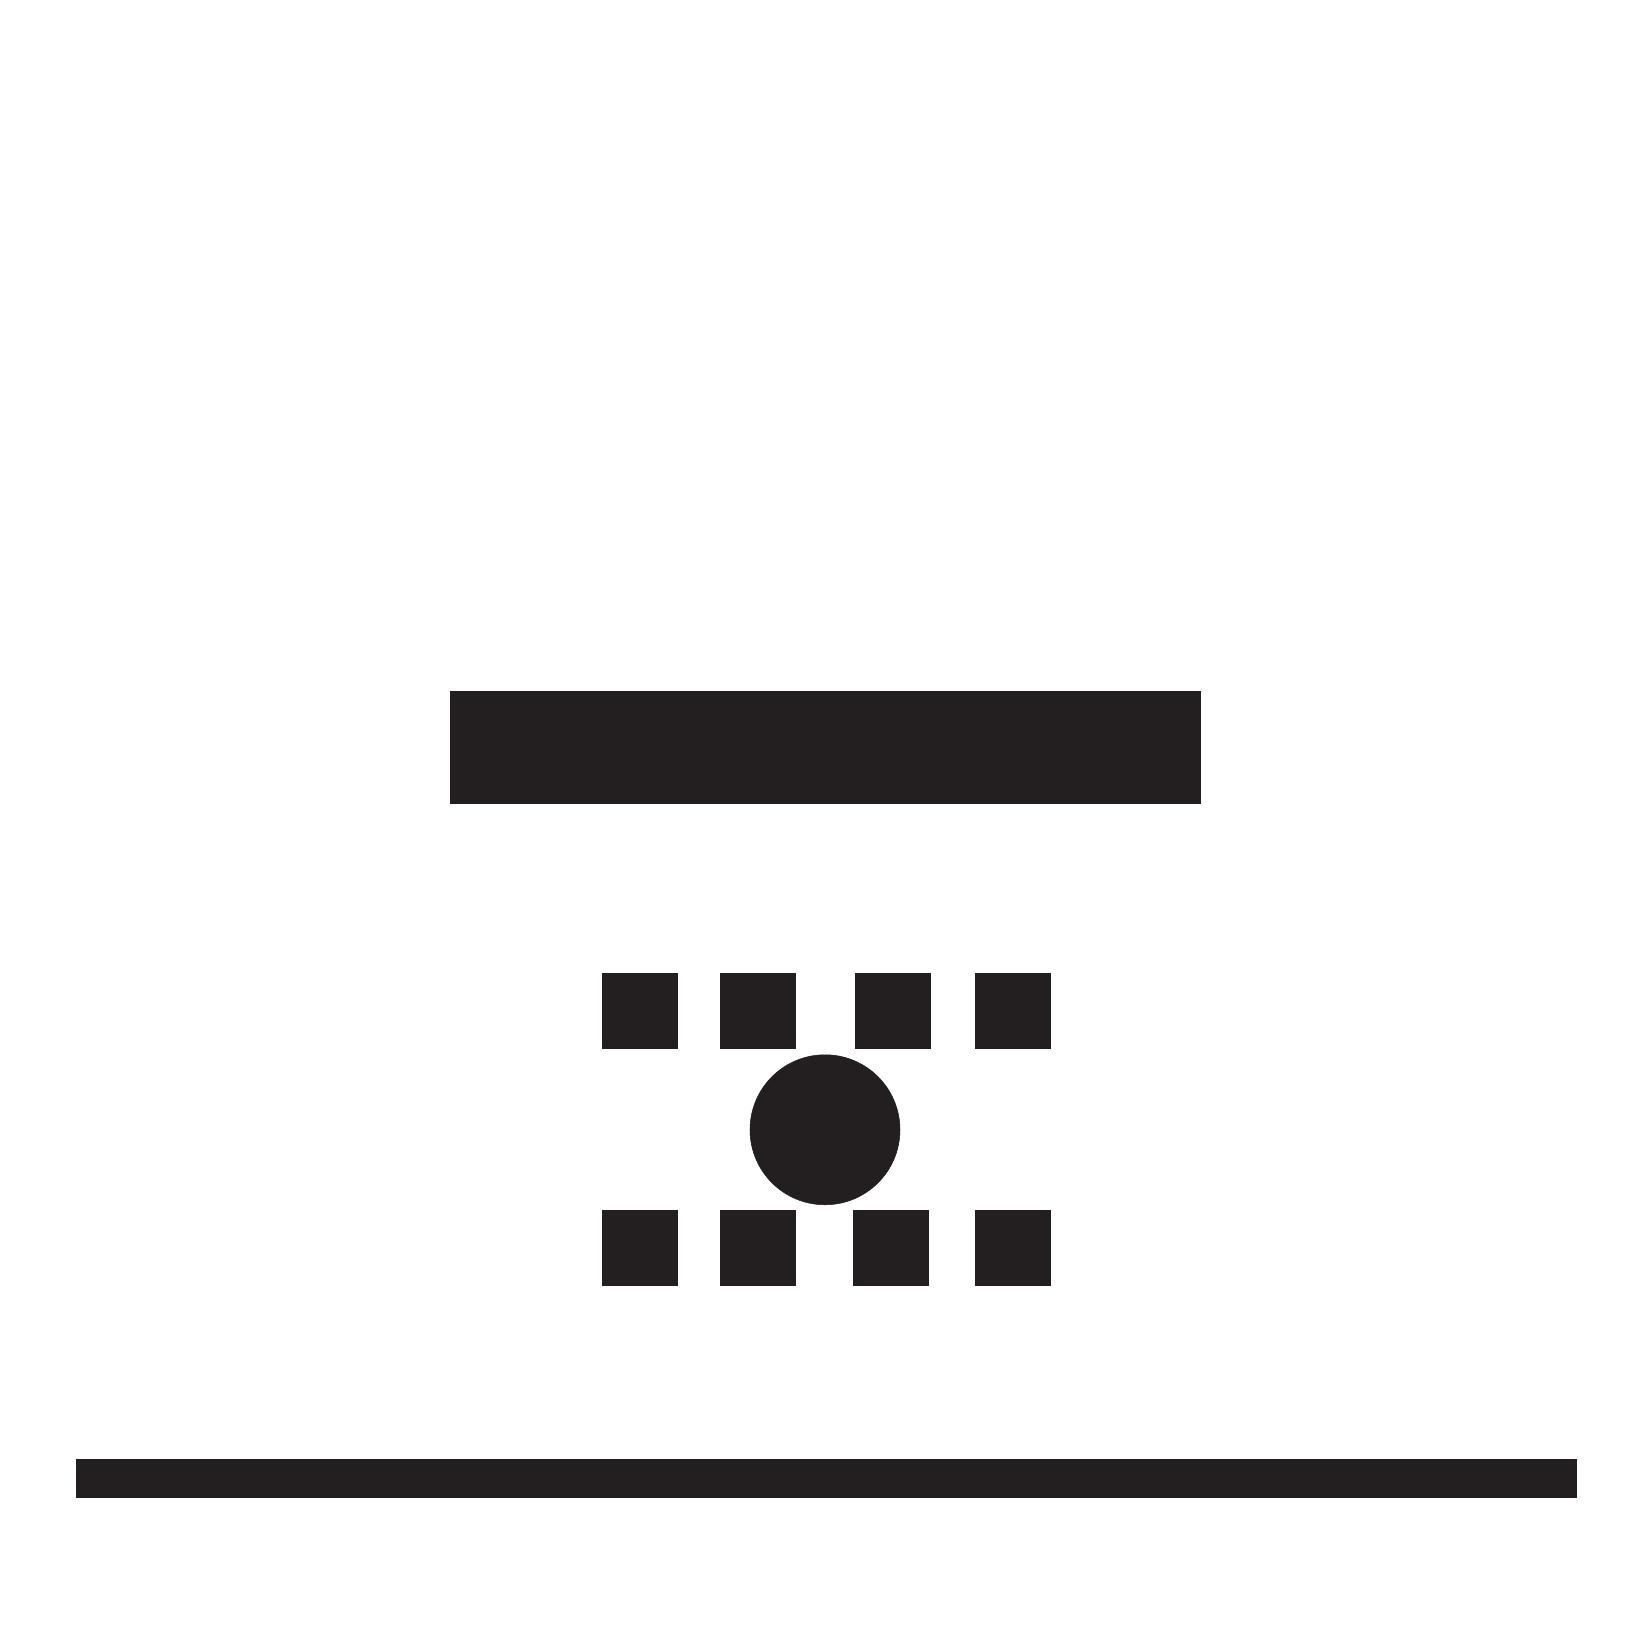 Assignment5_process2#2shapes_000001.jpg